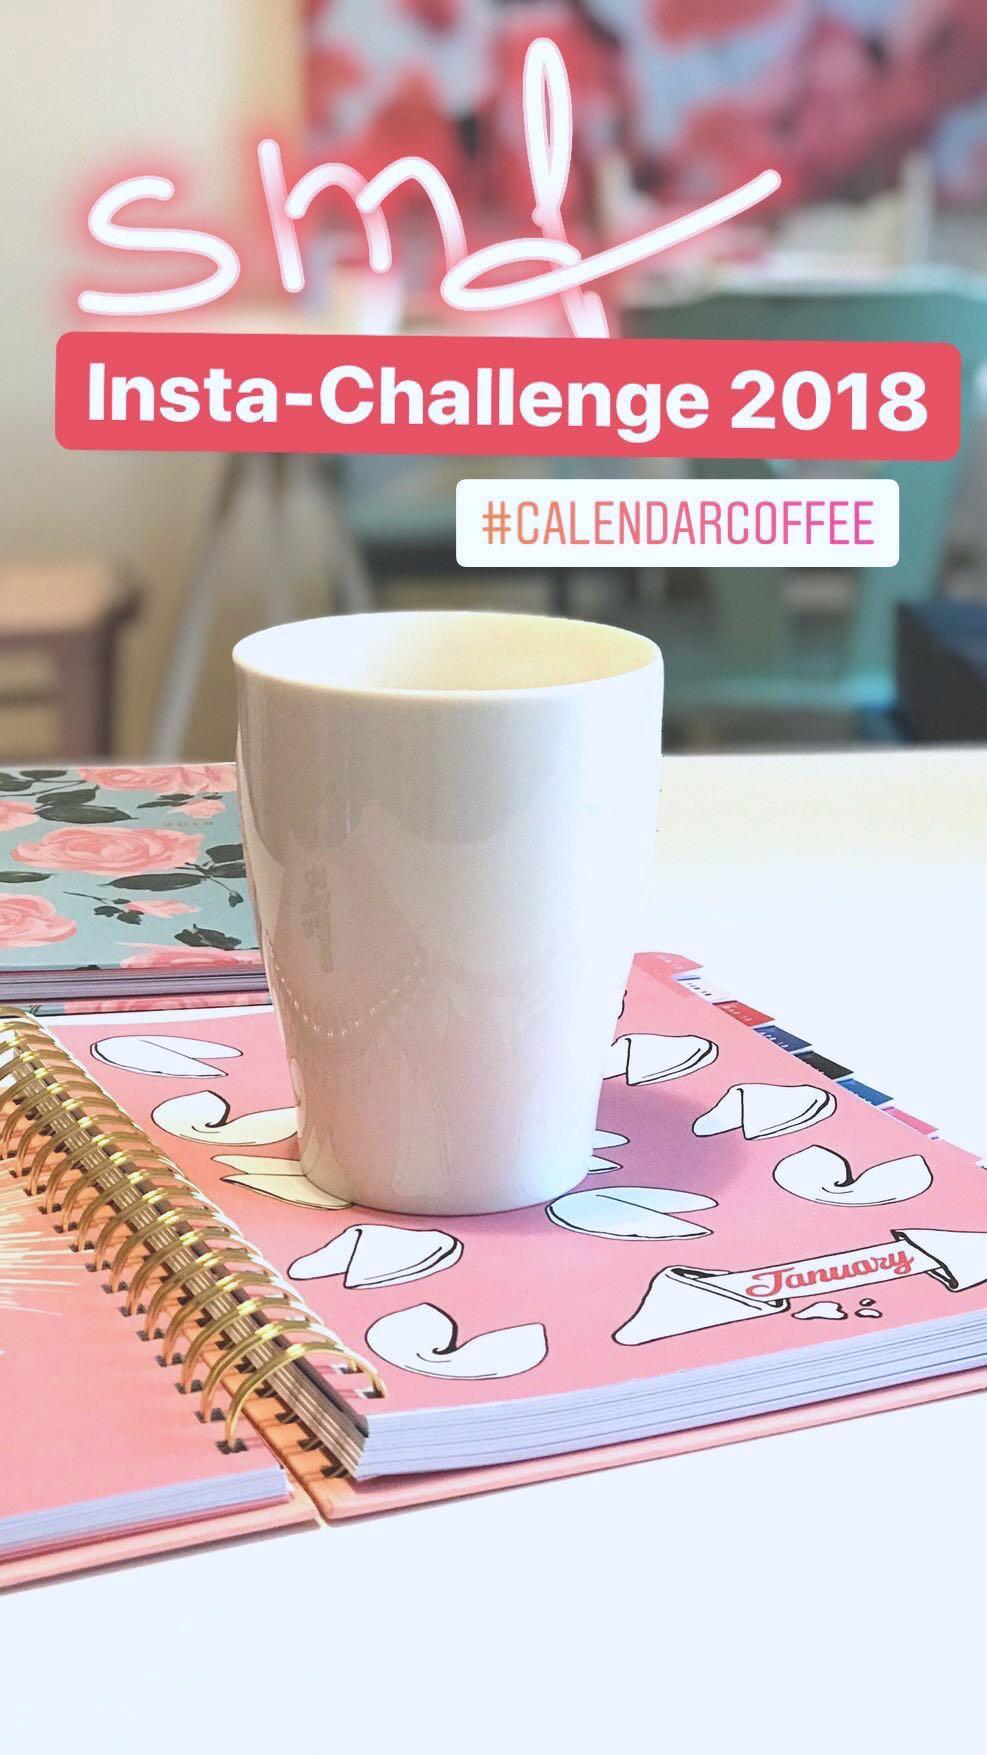 Instaschallenge: Kalender & Kaffeeliebe